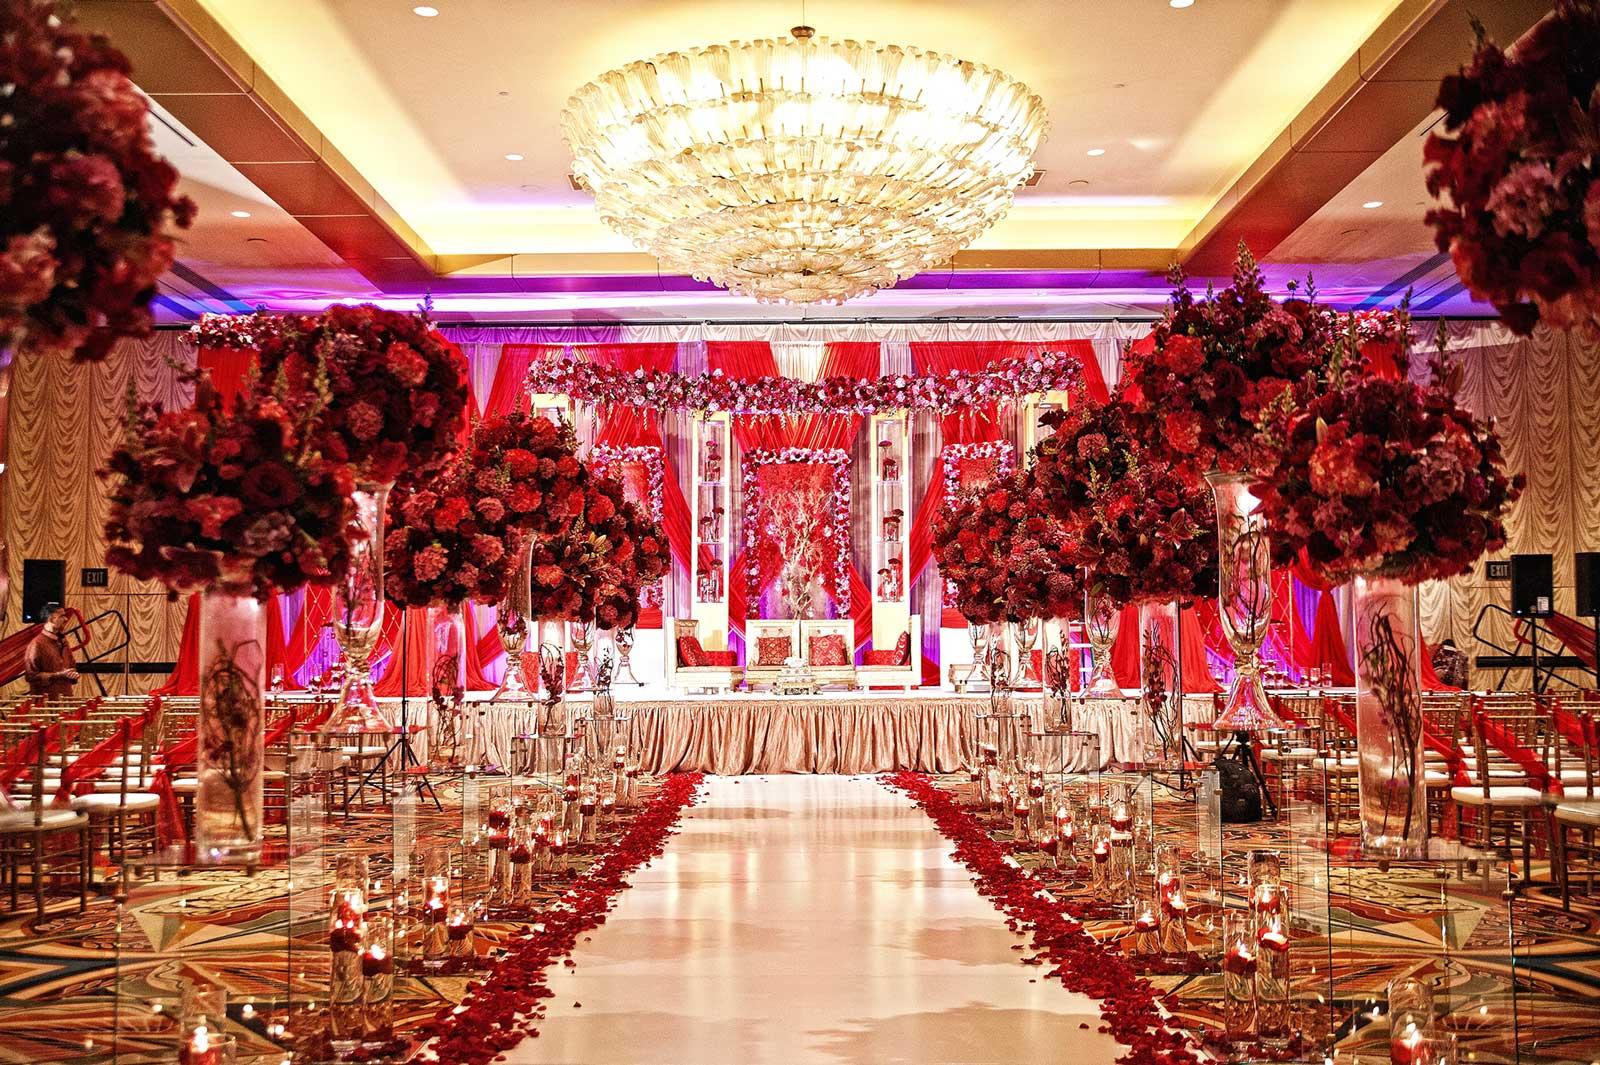 schwartz-woodward-houston-wedding-consultants-coordinators-Margie_Josh_Wedding0116_tomas_ramos-4.jpg